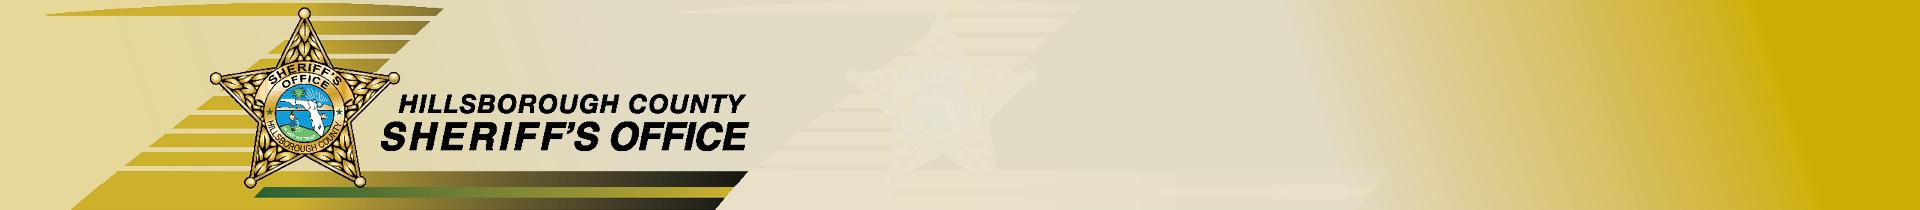 Hillsborough Sheriff Badge